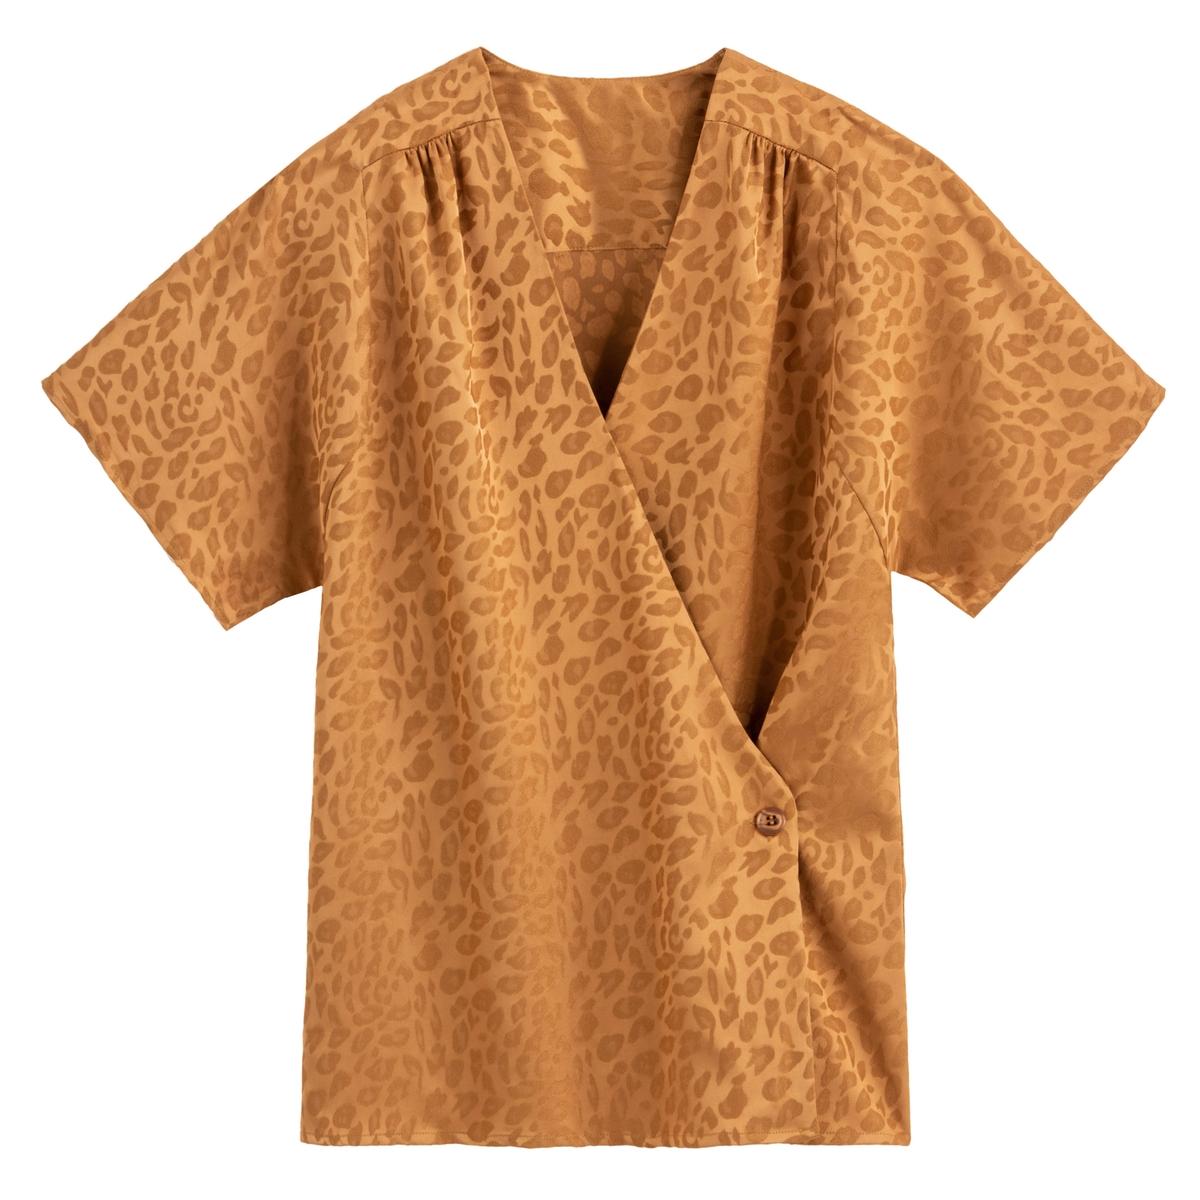 Blusa con cuello de pico y manga corta